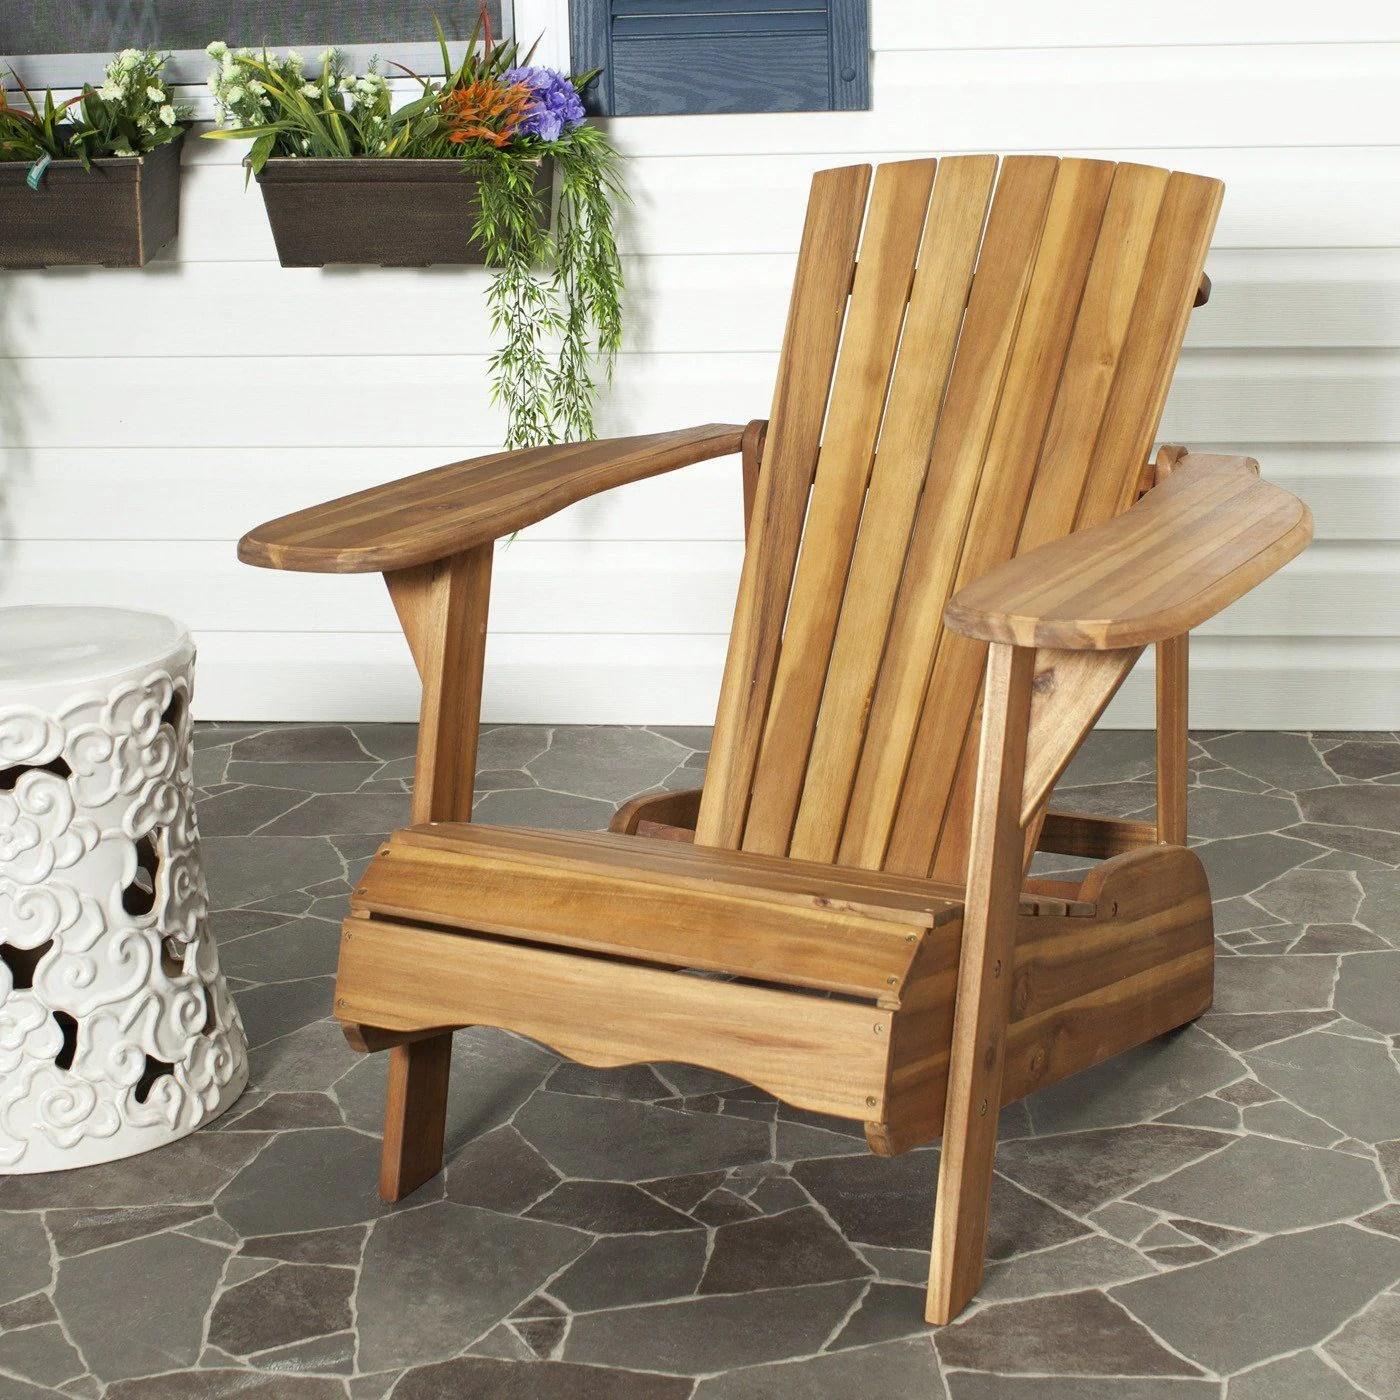 Amazing Deal Safavieh Pat6700c Mopani Adirondack Chair